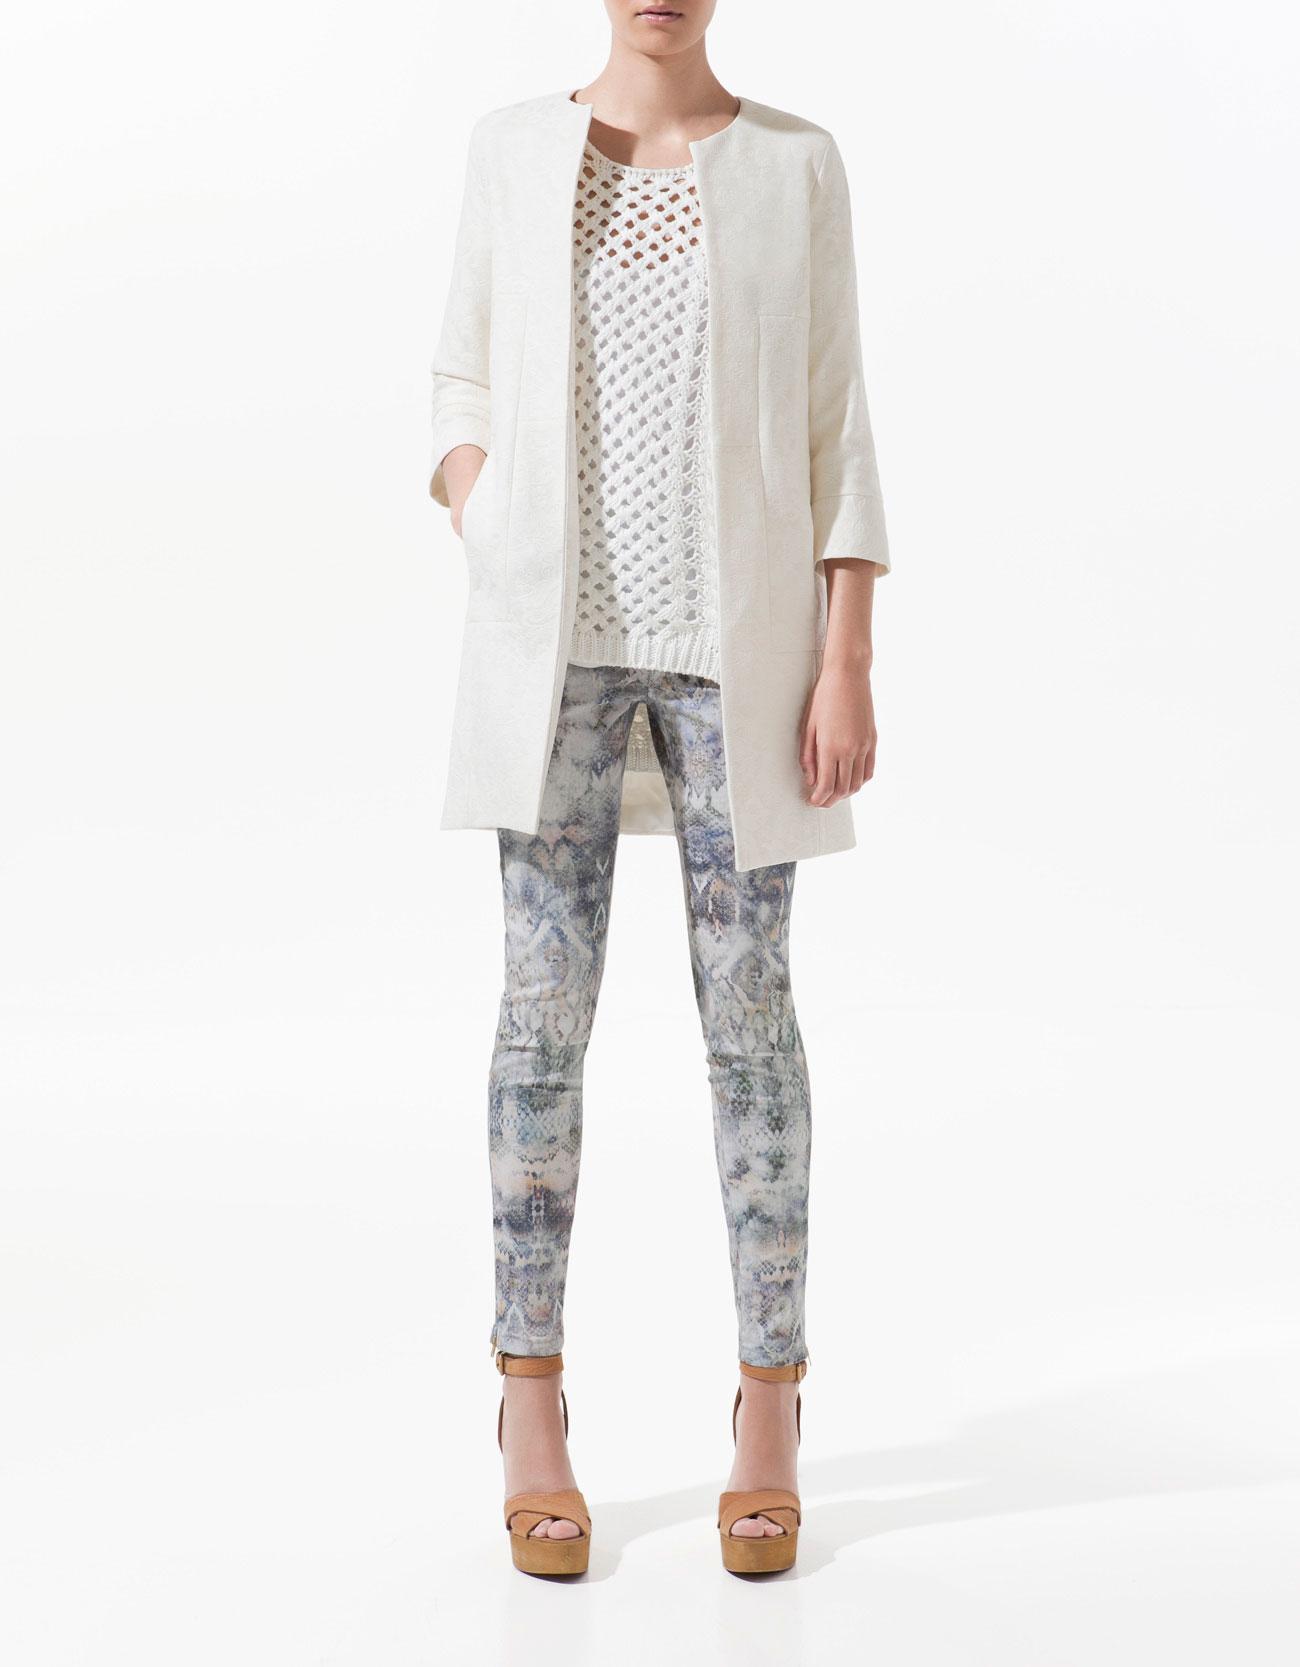 zara-ecru-seamed-lace-coat-product-1-3547457-132019899.jpeg